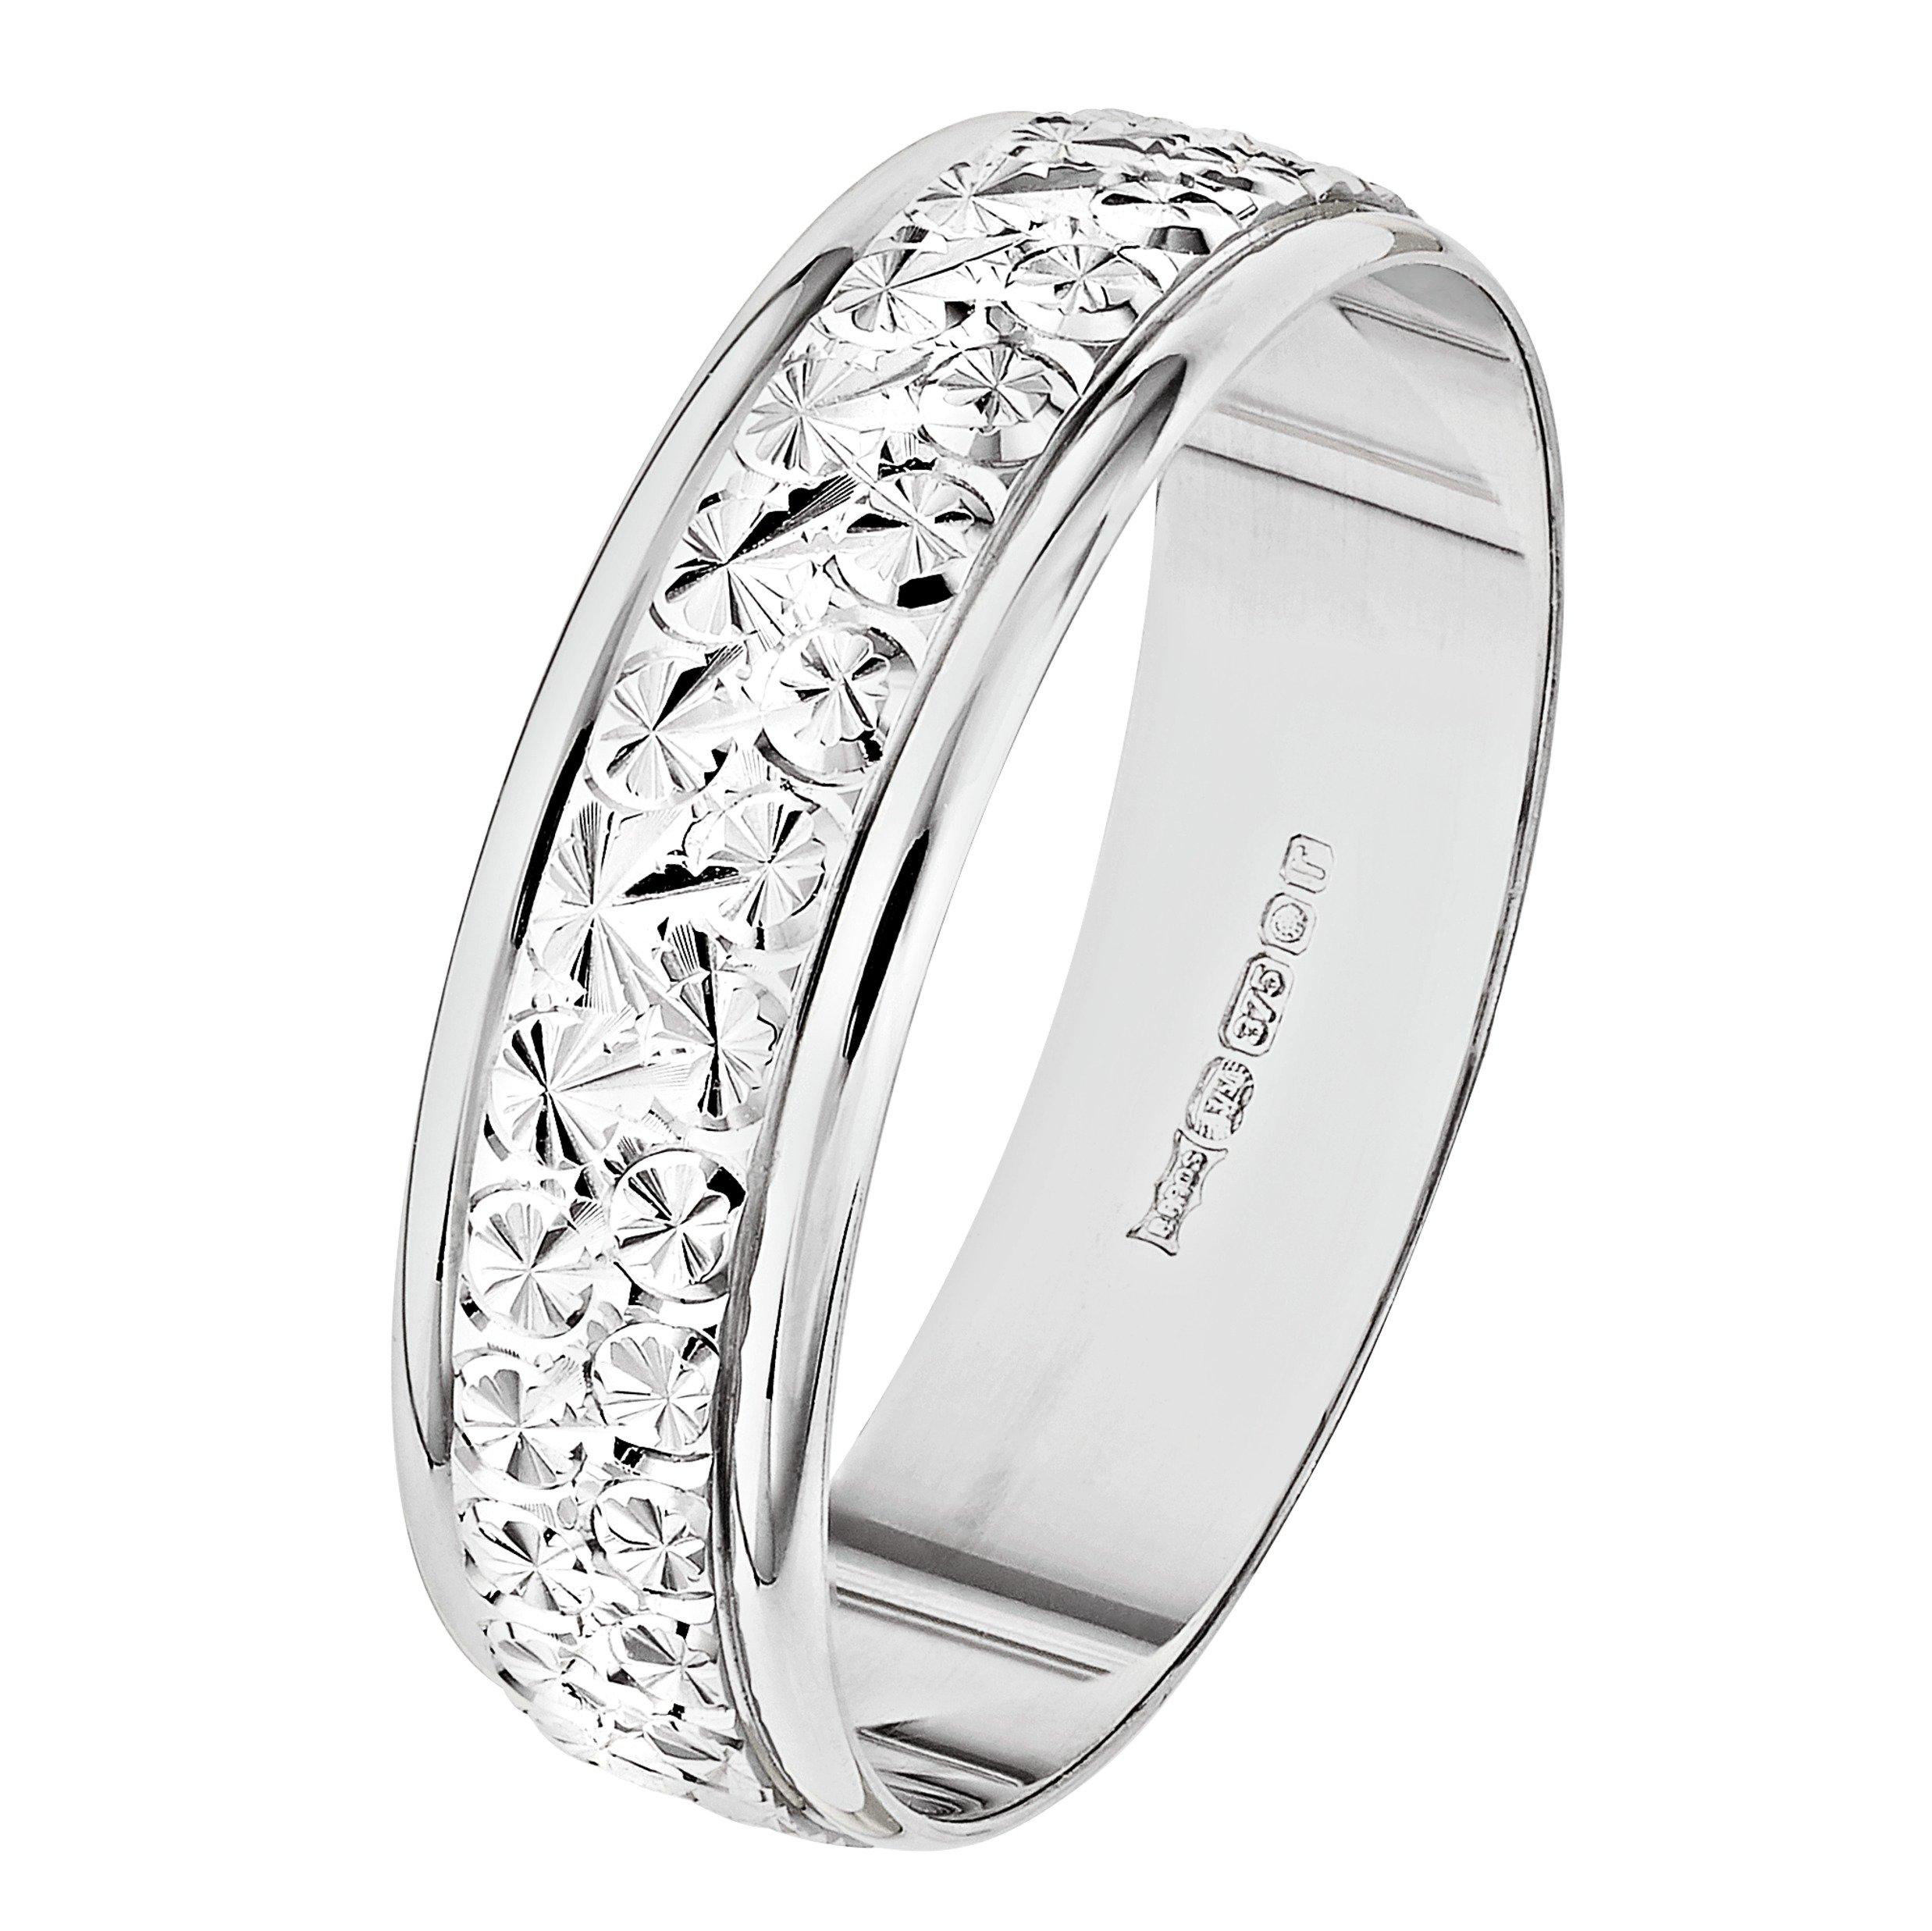 Buy Revere 9ct White Gold Diamond Cut Wedding Ring Ladies wedding